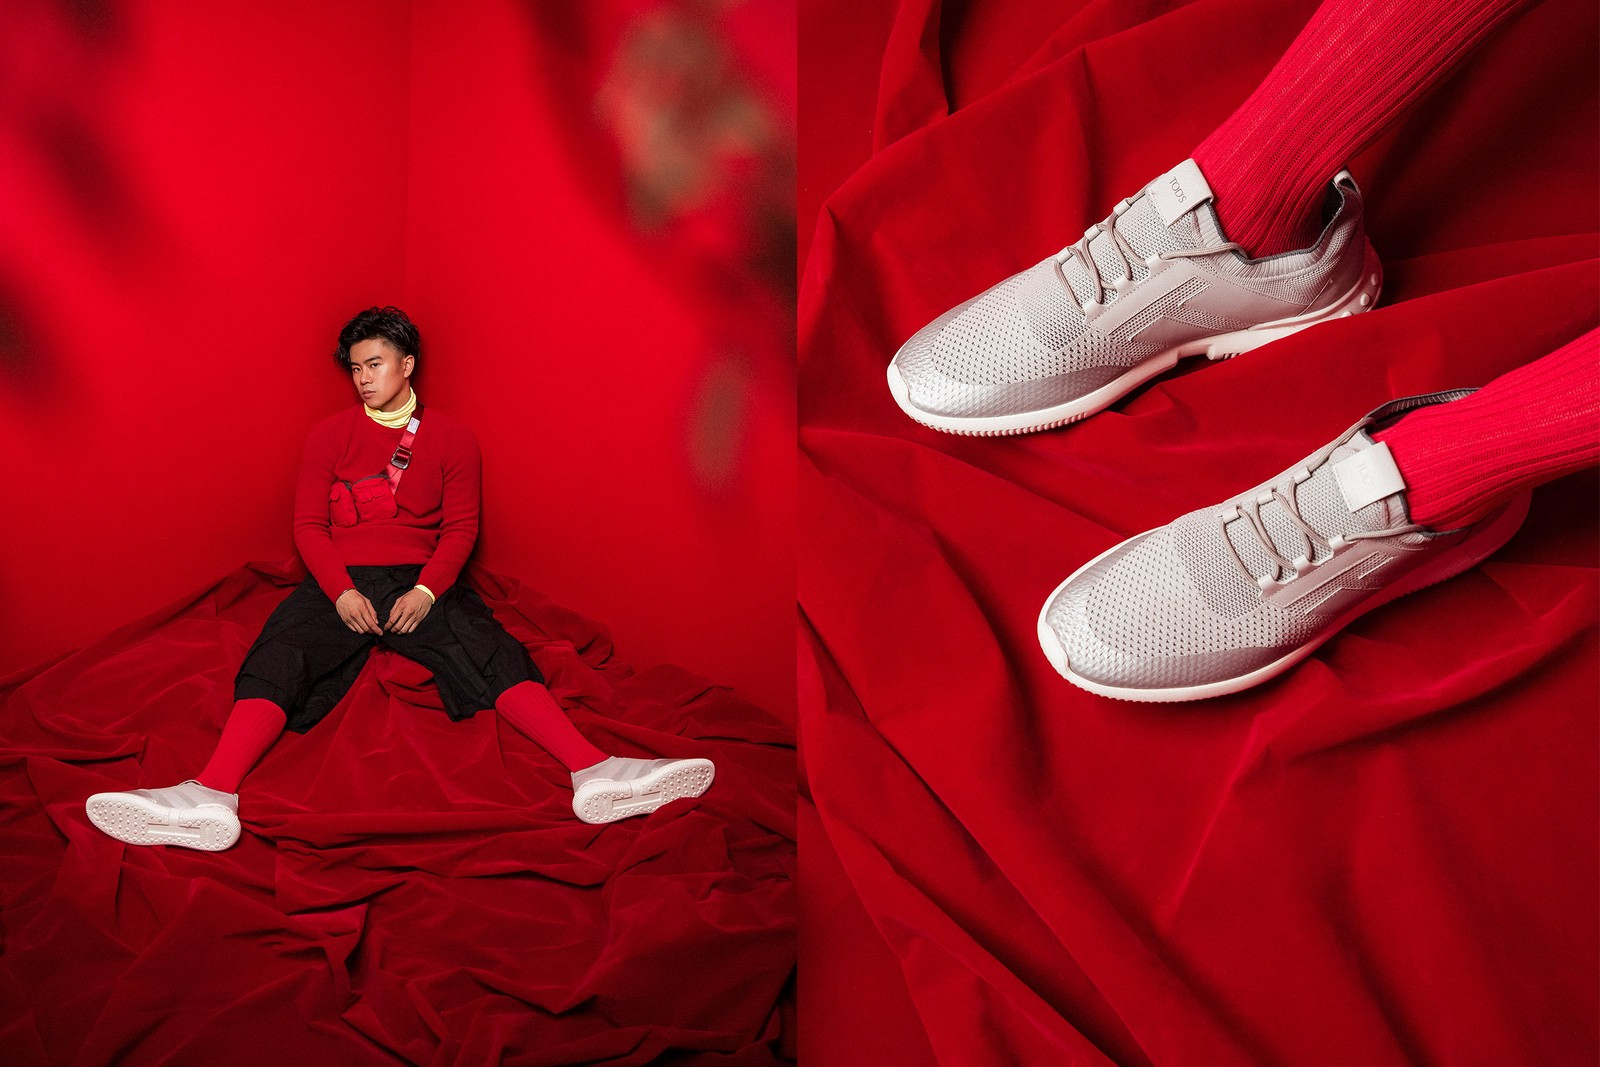 Kevin 廖柏雅以音樂風格演繹 TOD'S NO_CODE 最新鞋履作品